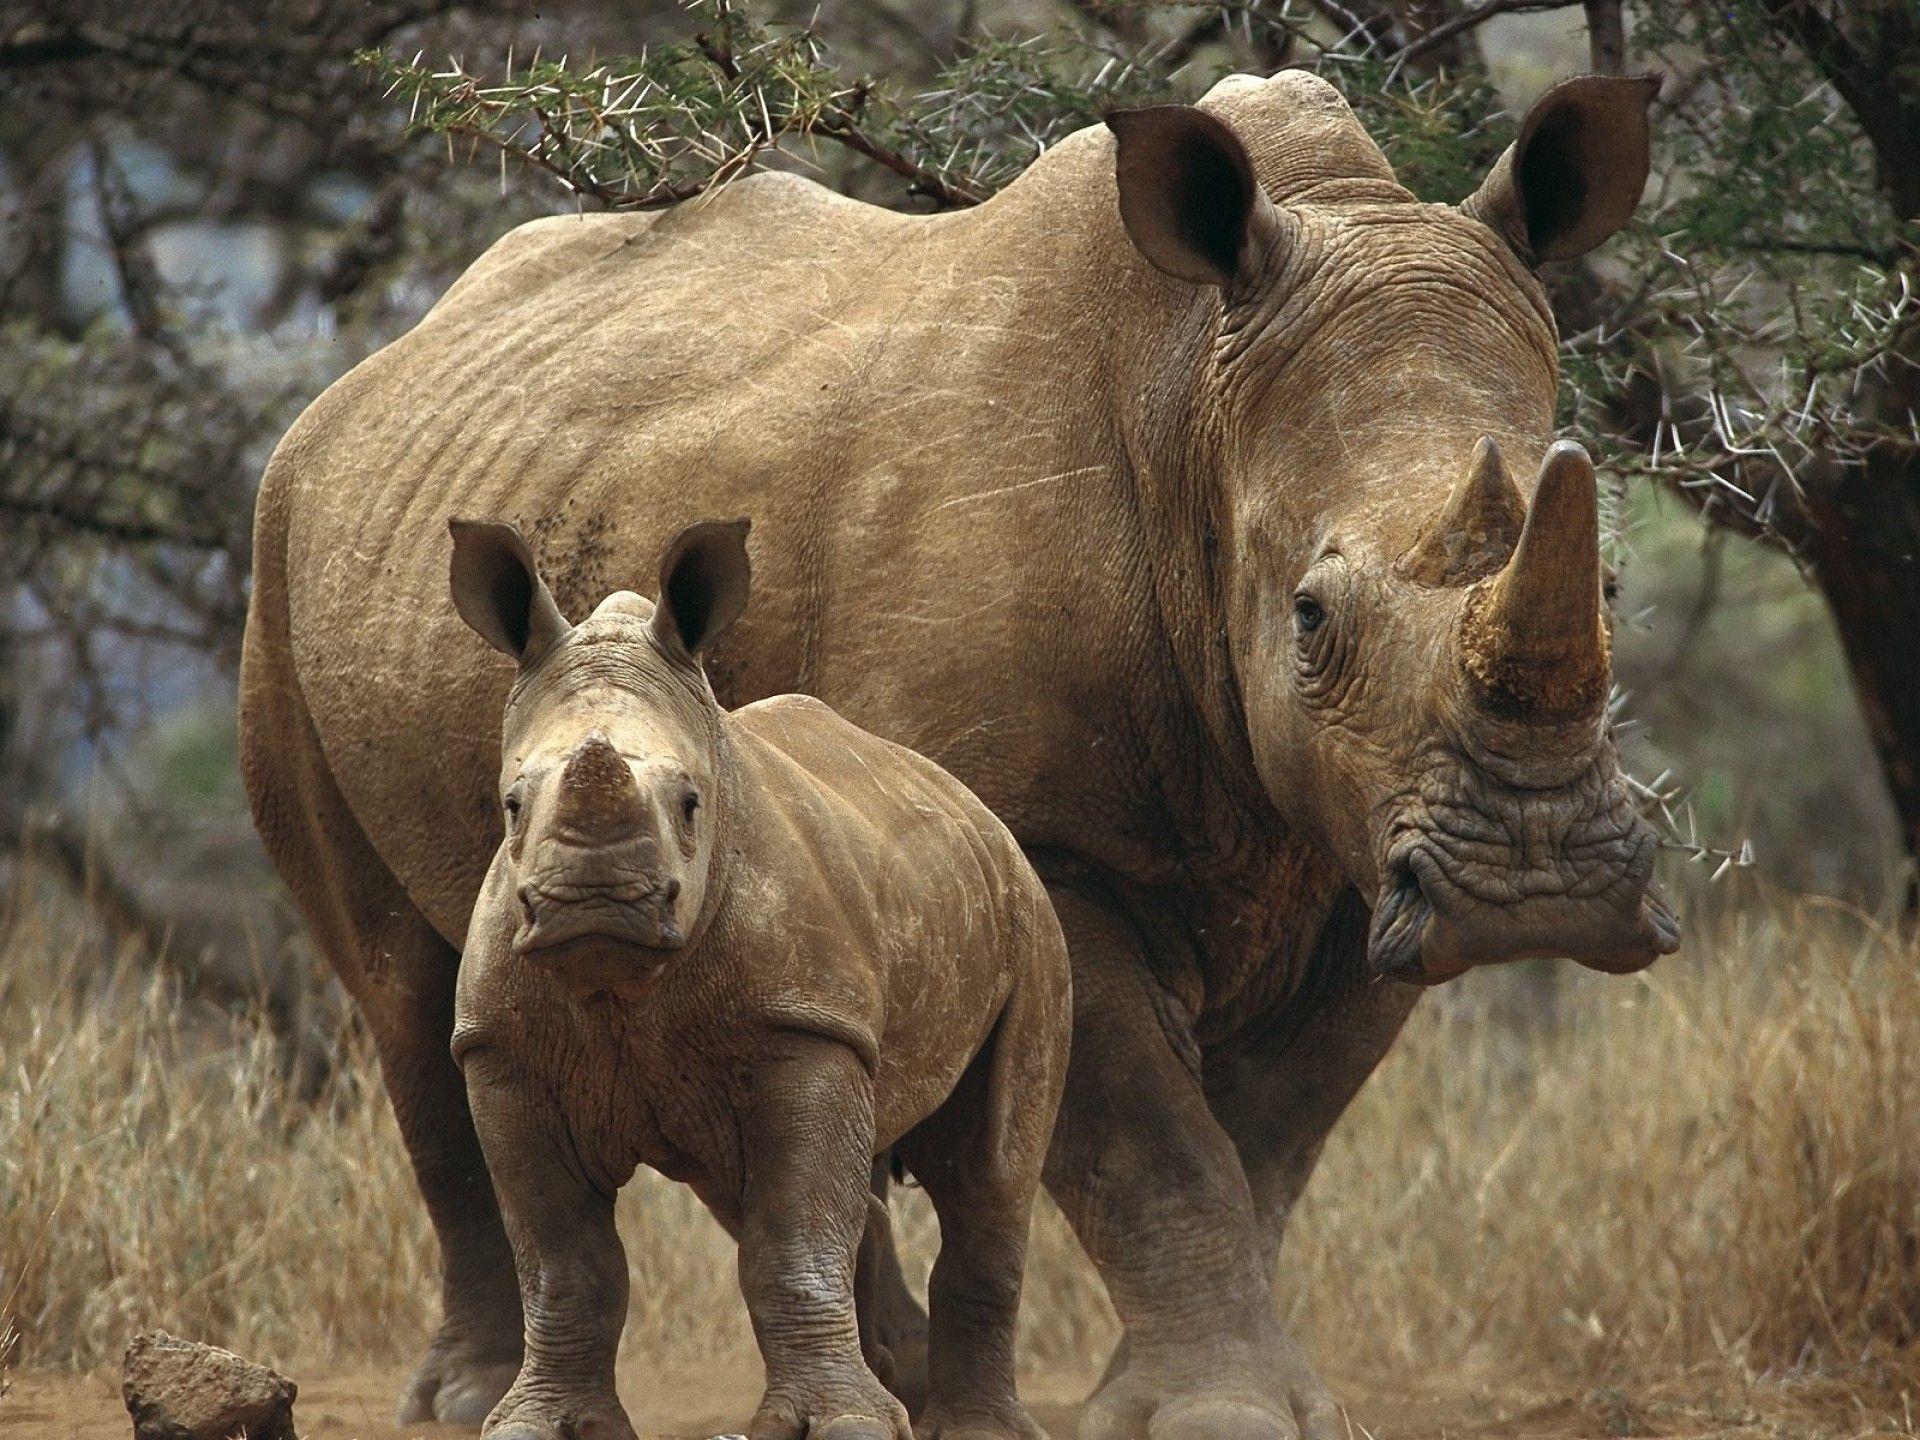 animal rhino wallpaper | rinoceronte | pinterest | rhinos and animal